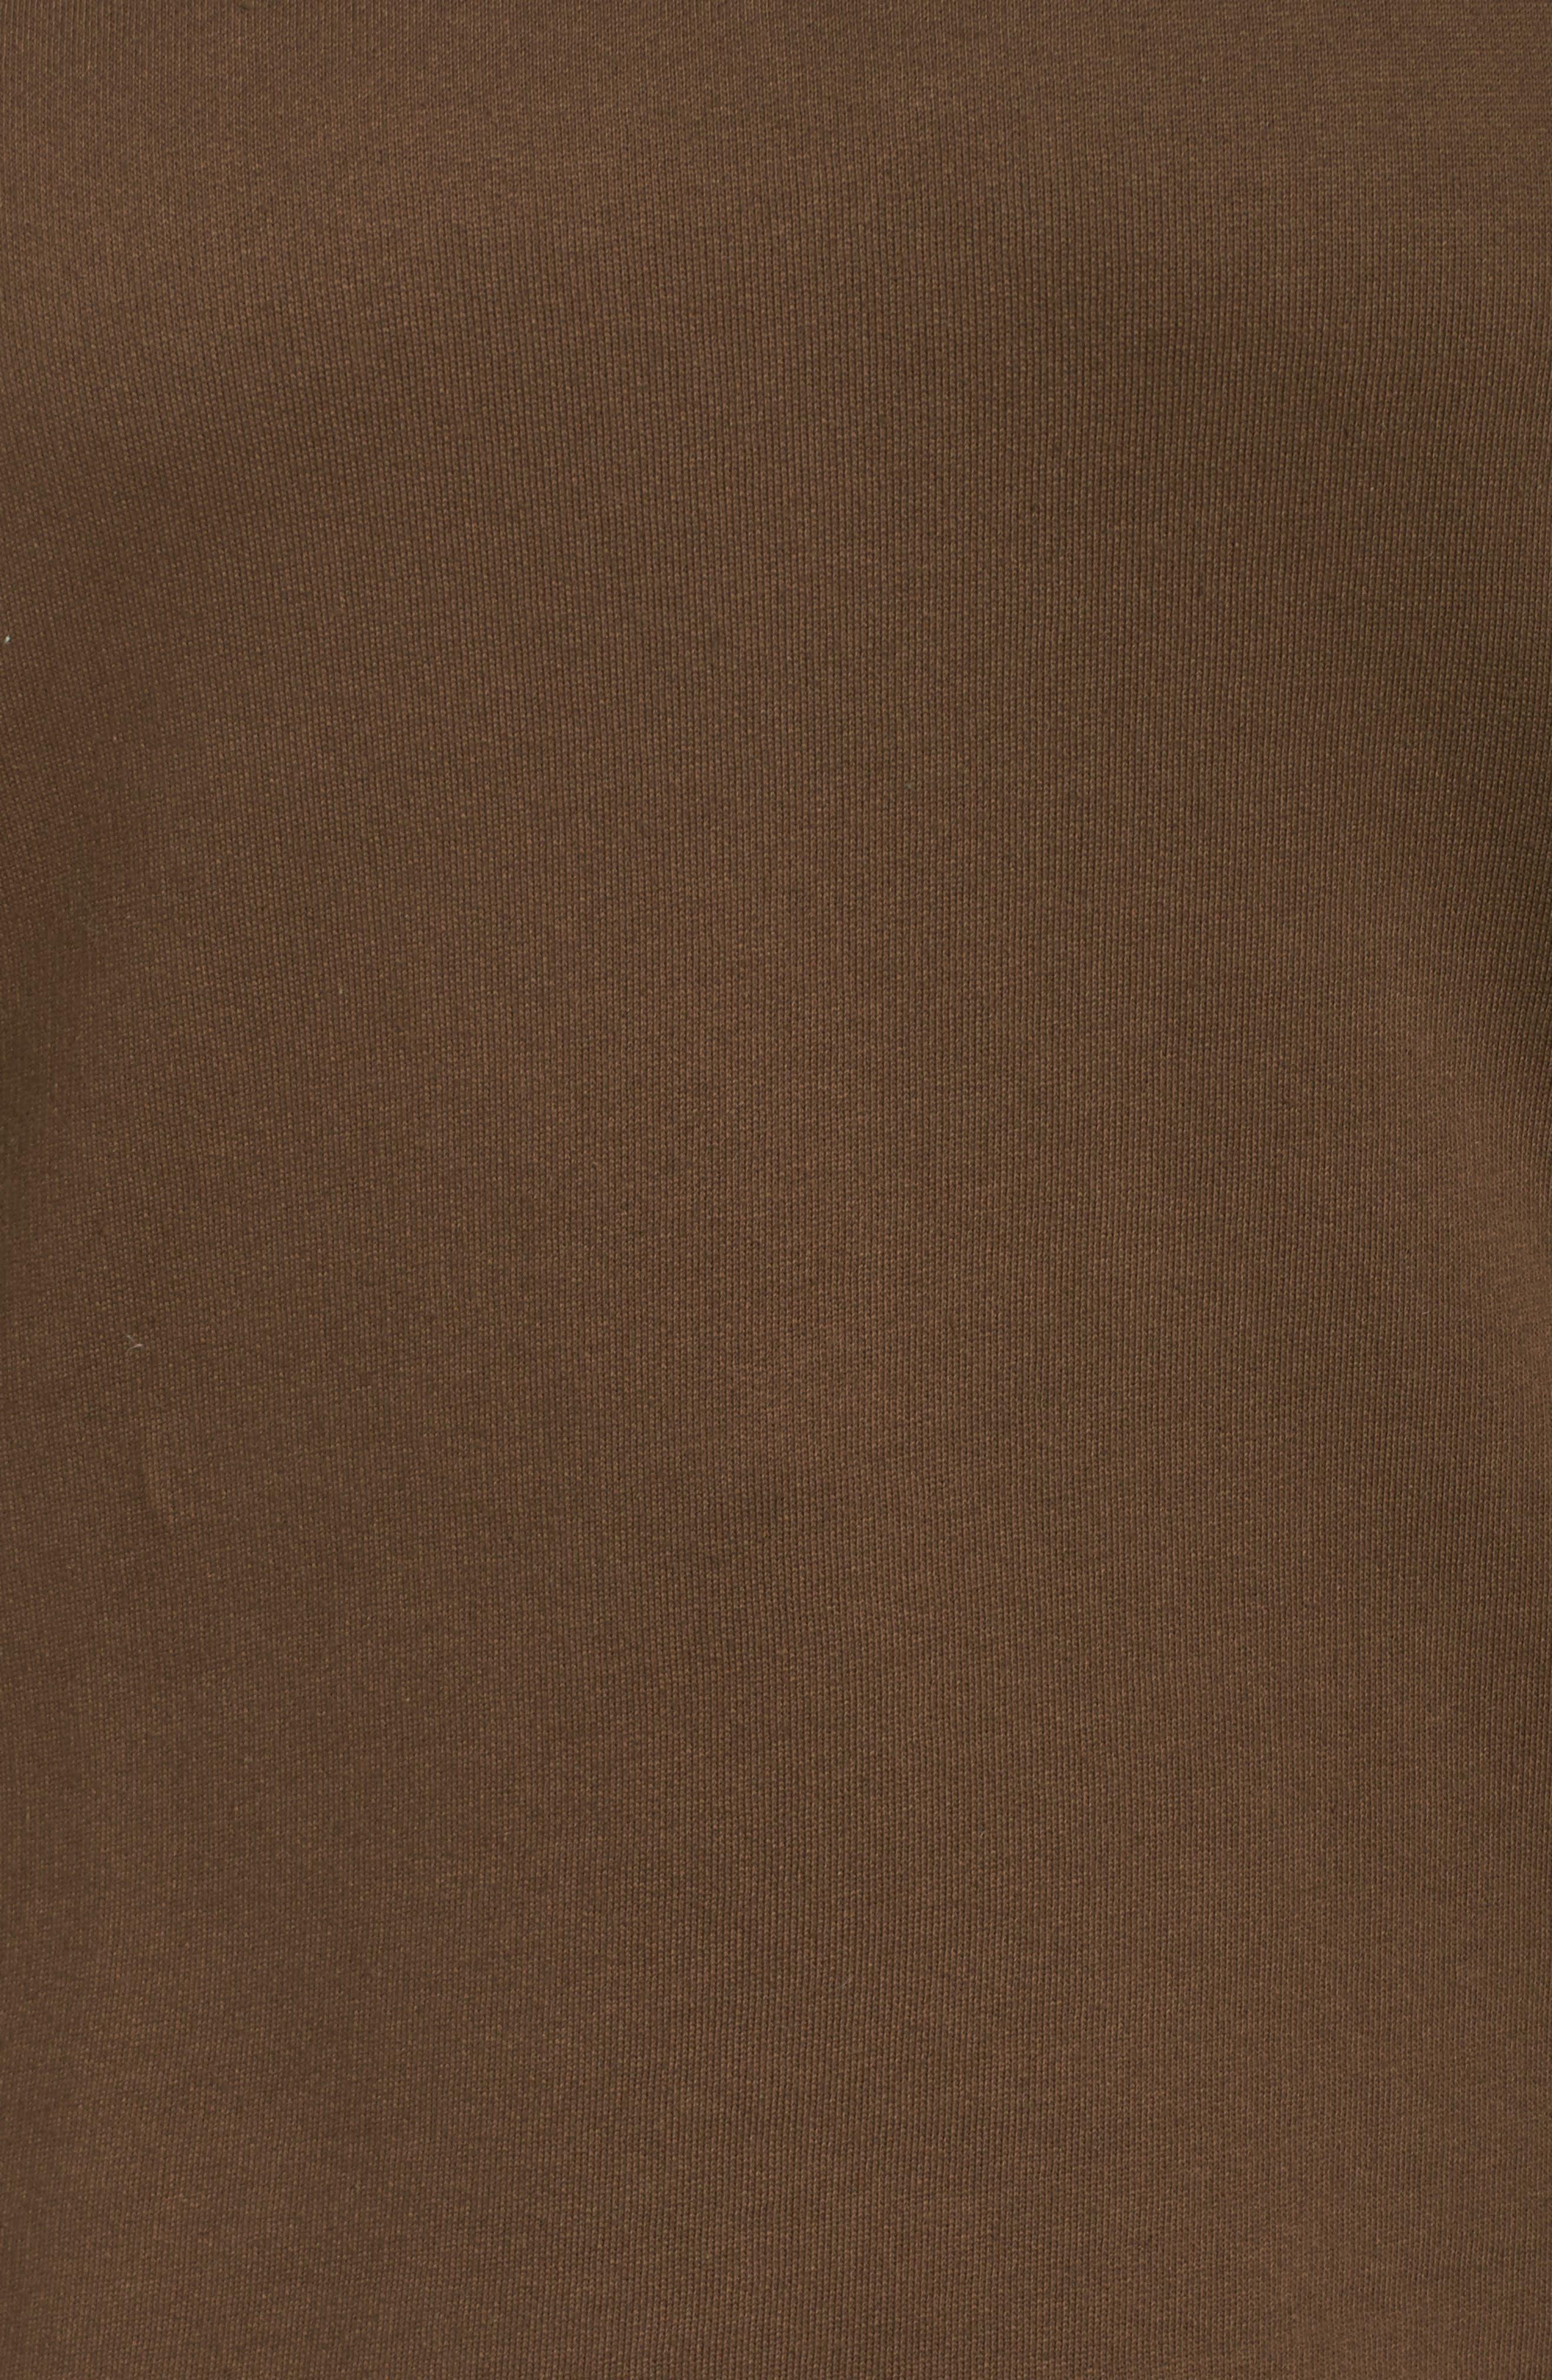 Ruffle Sleeve Sweatshirt,                             Alternate thumbnail 5, color,                             Tree Moss